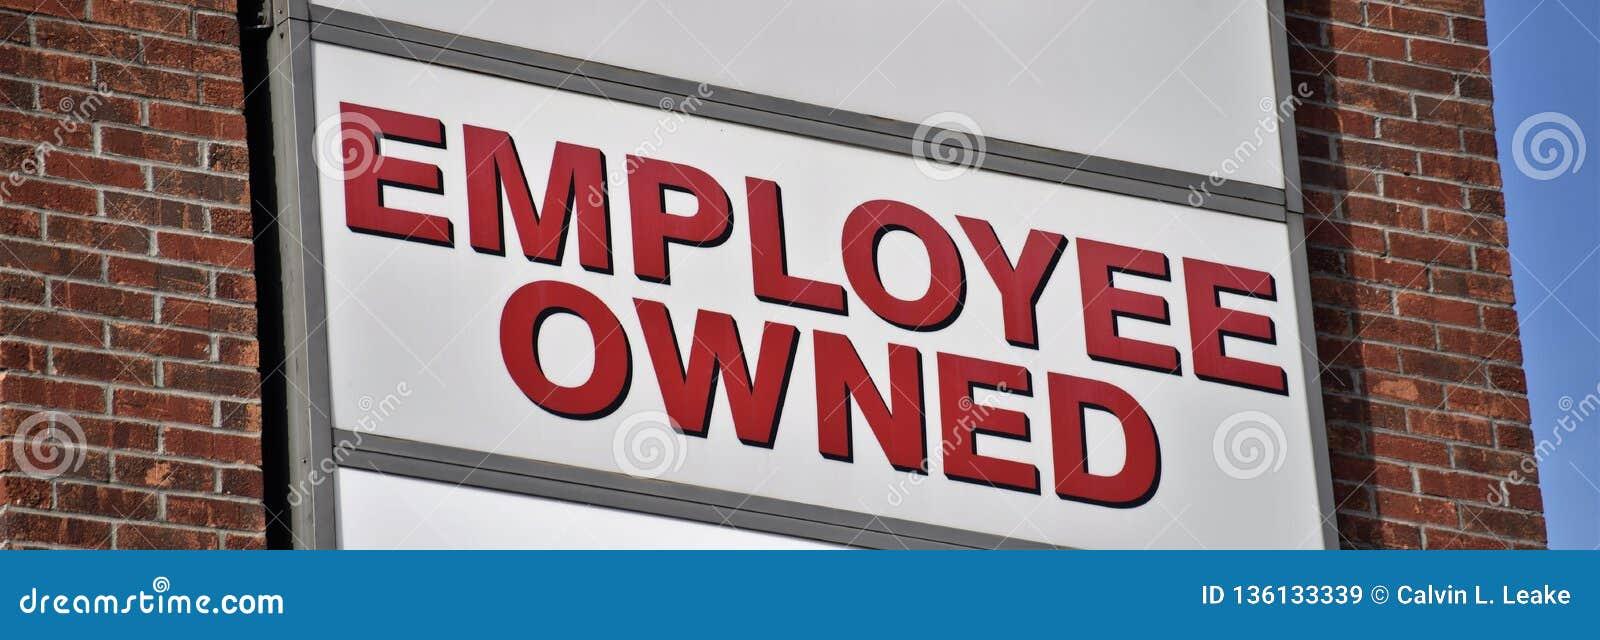 employee-stock-ownership-plan-esop-employee-owner-program-provides-company-s-workforce-ownership-interest-136133339.jpg?profile=RESIZE_400x